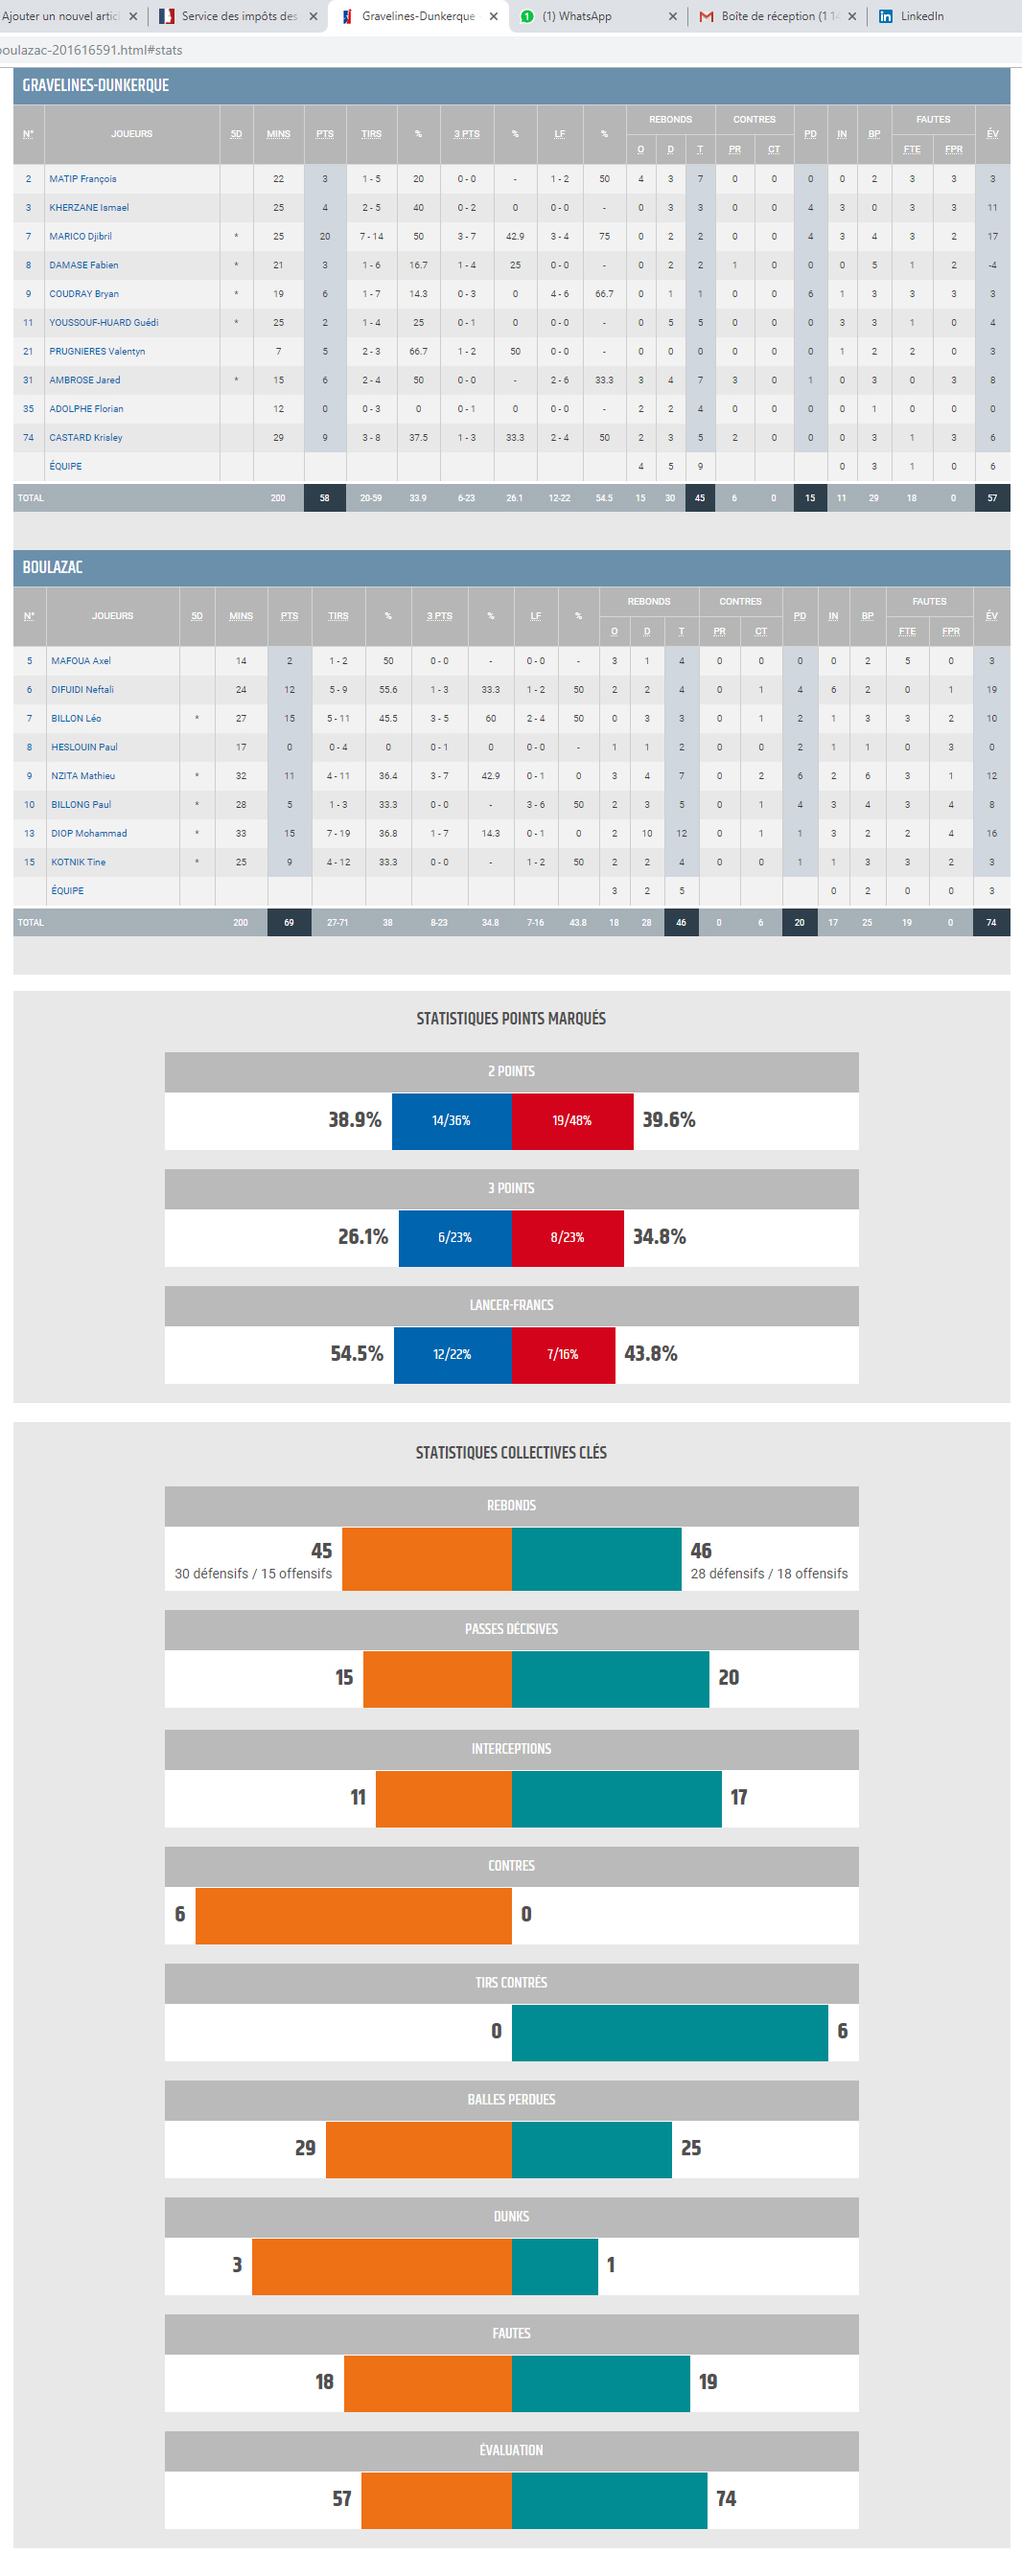 Espoirs03_Gravelines vs BBD_STATS